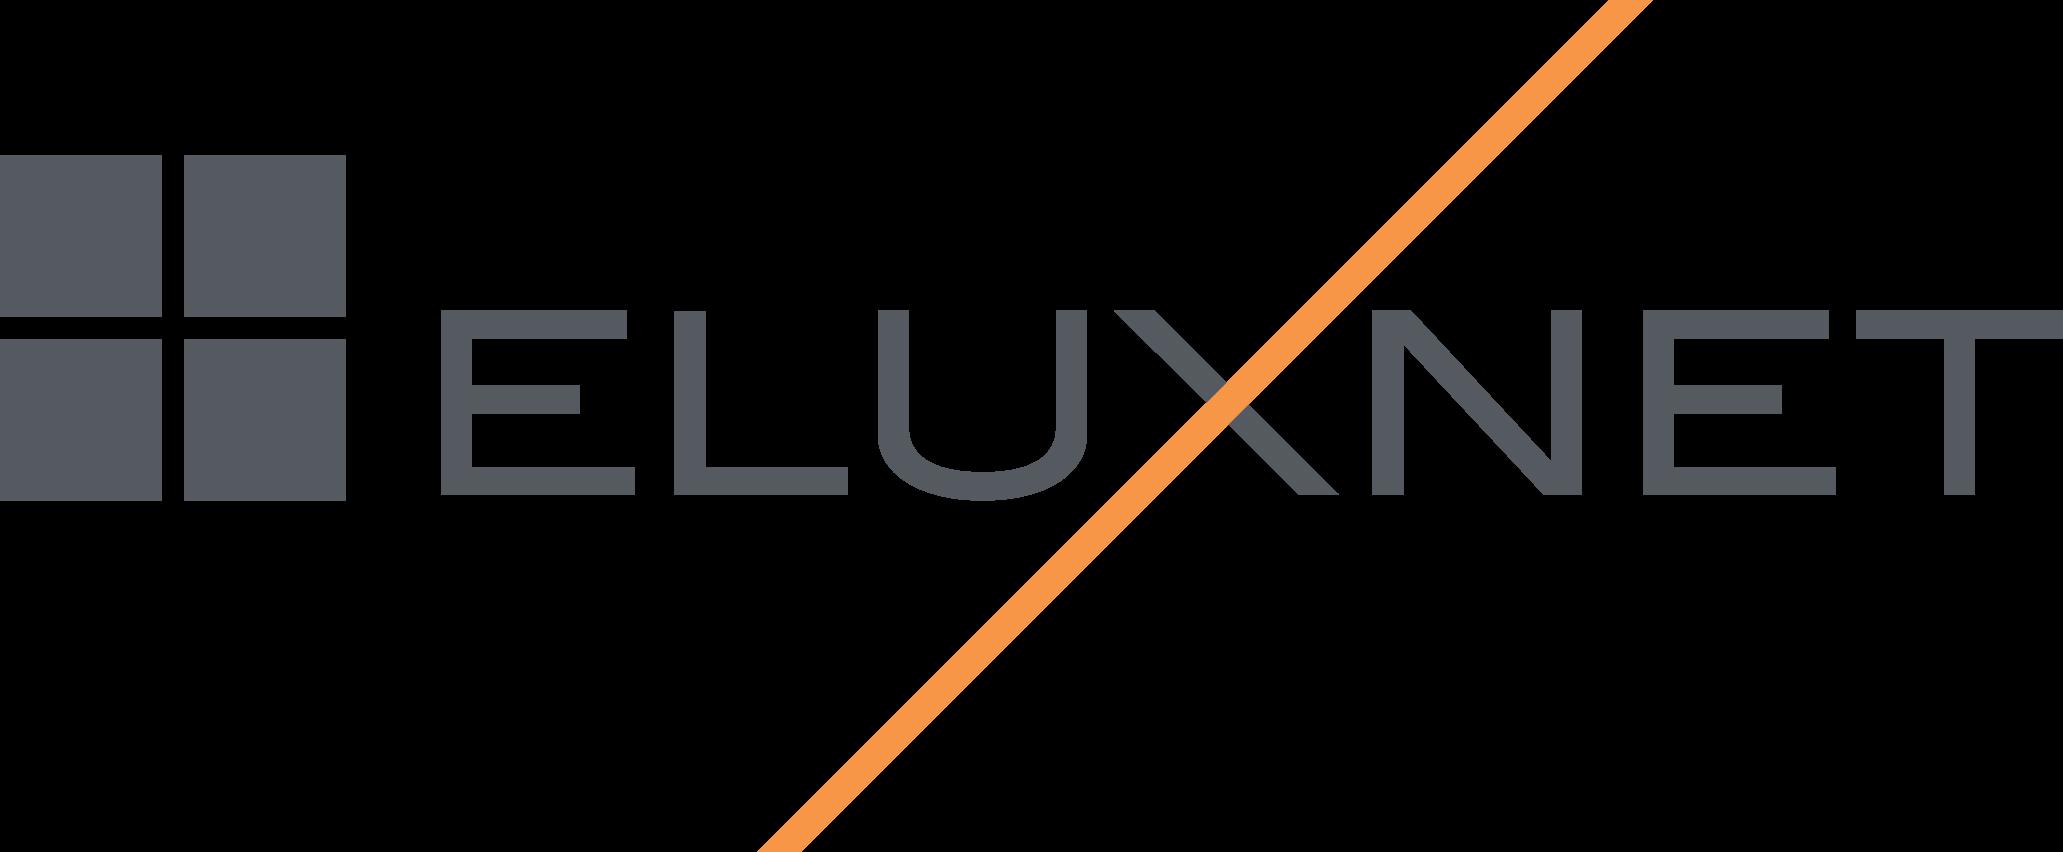 Eluxnet